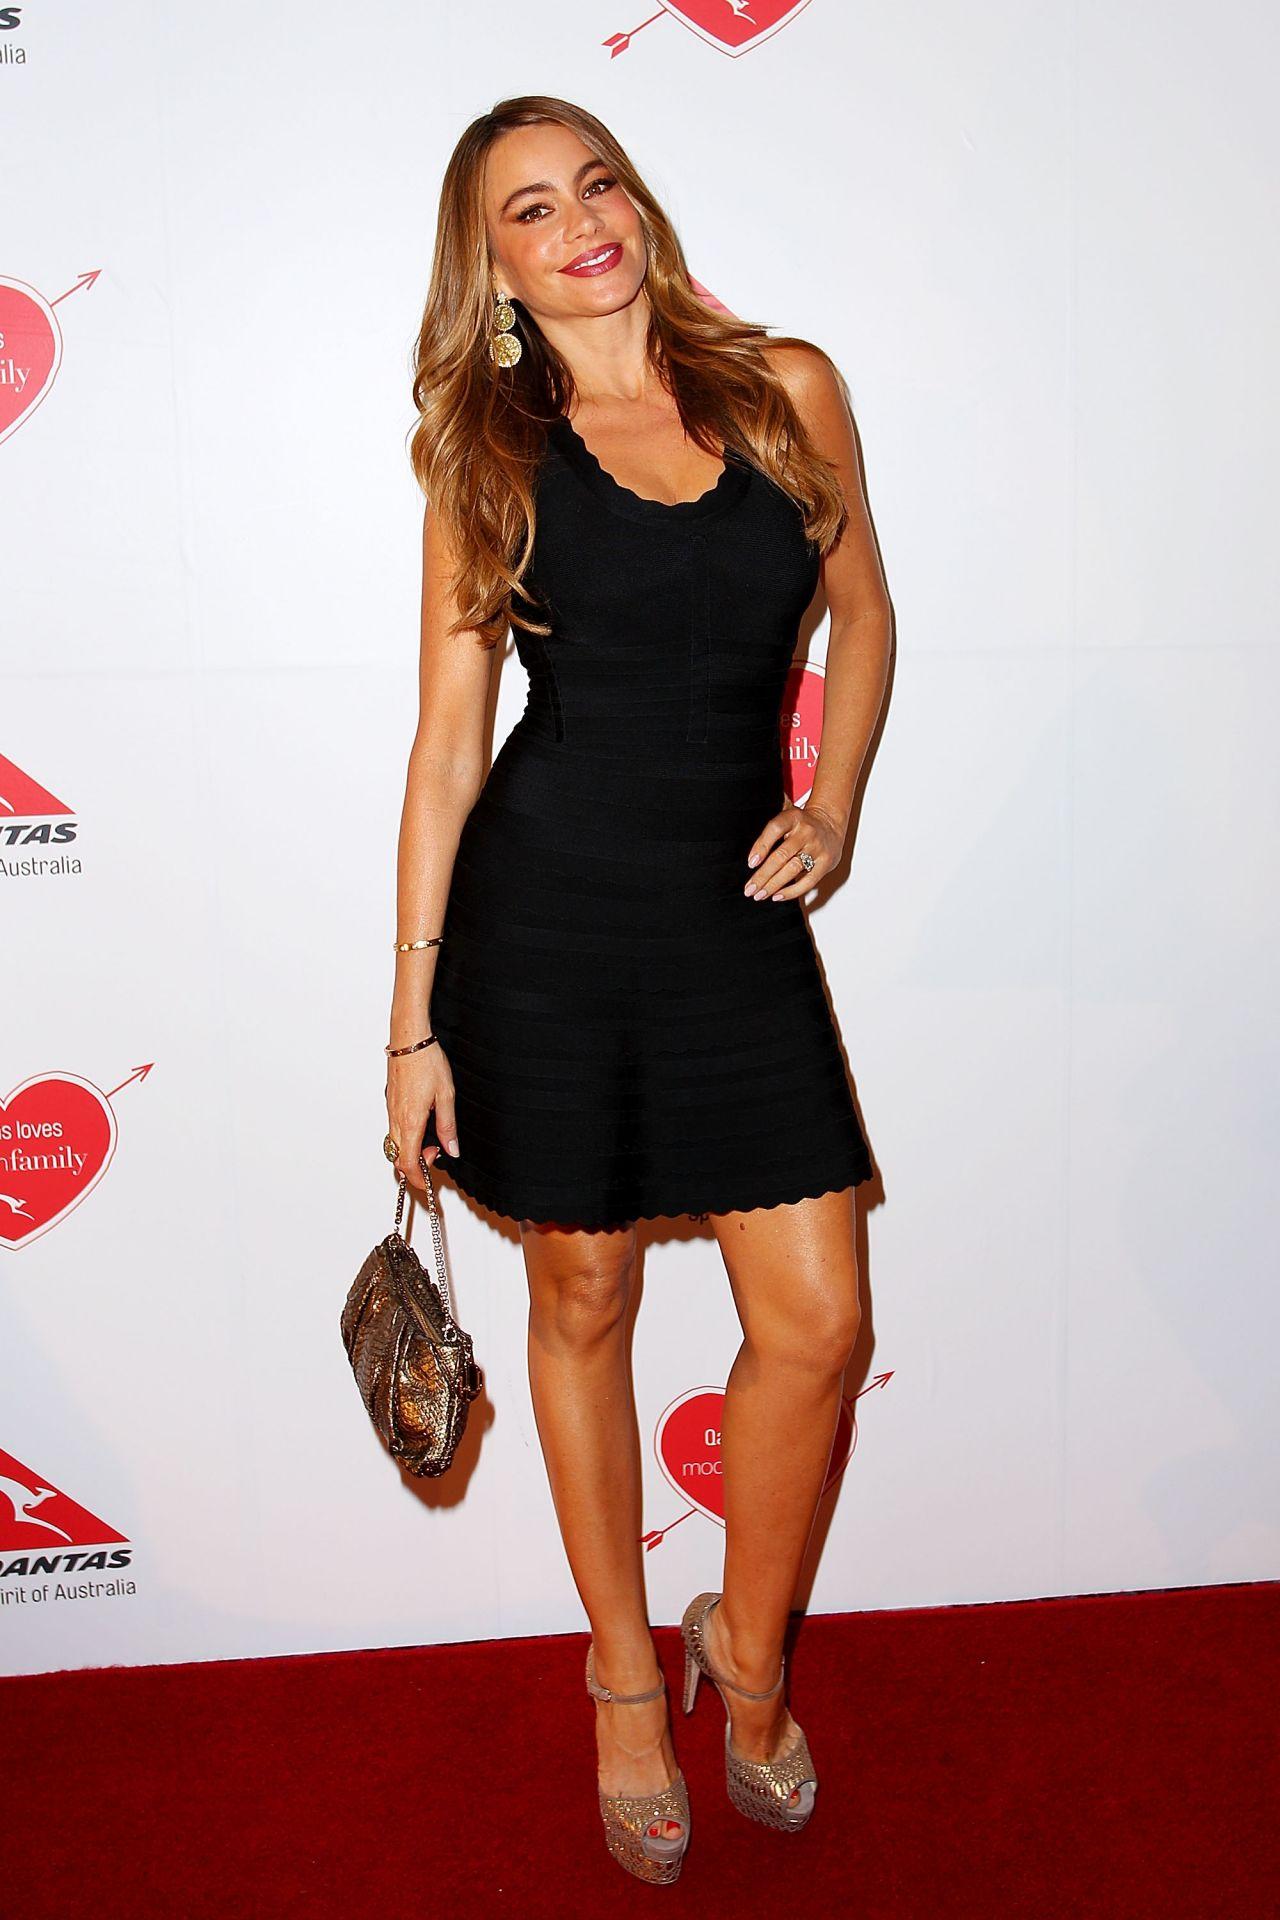 Sofia Vergara Wearing Herve Leger Mini Dress - 'Modern